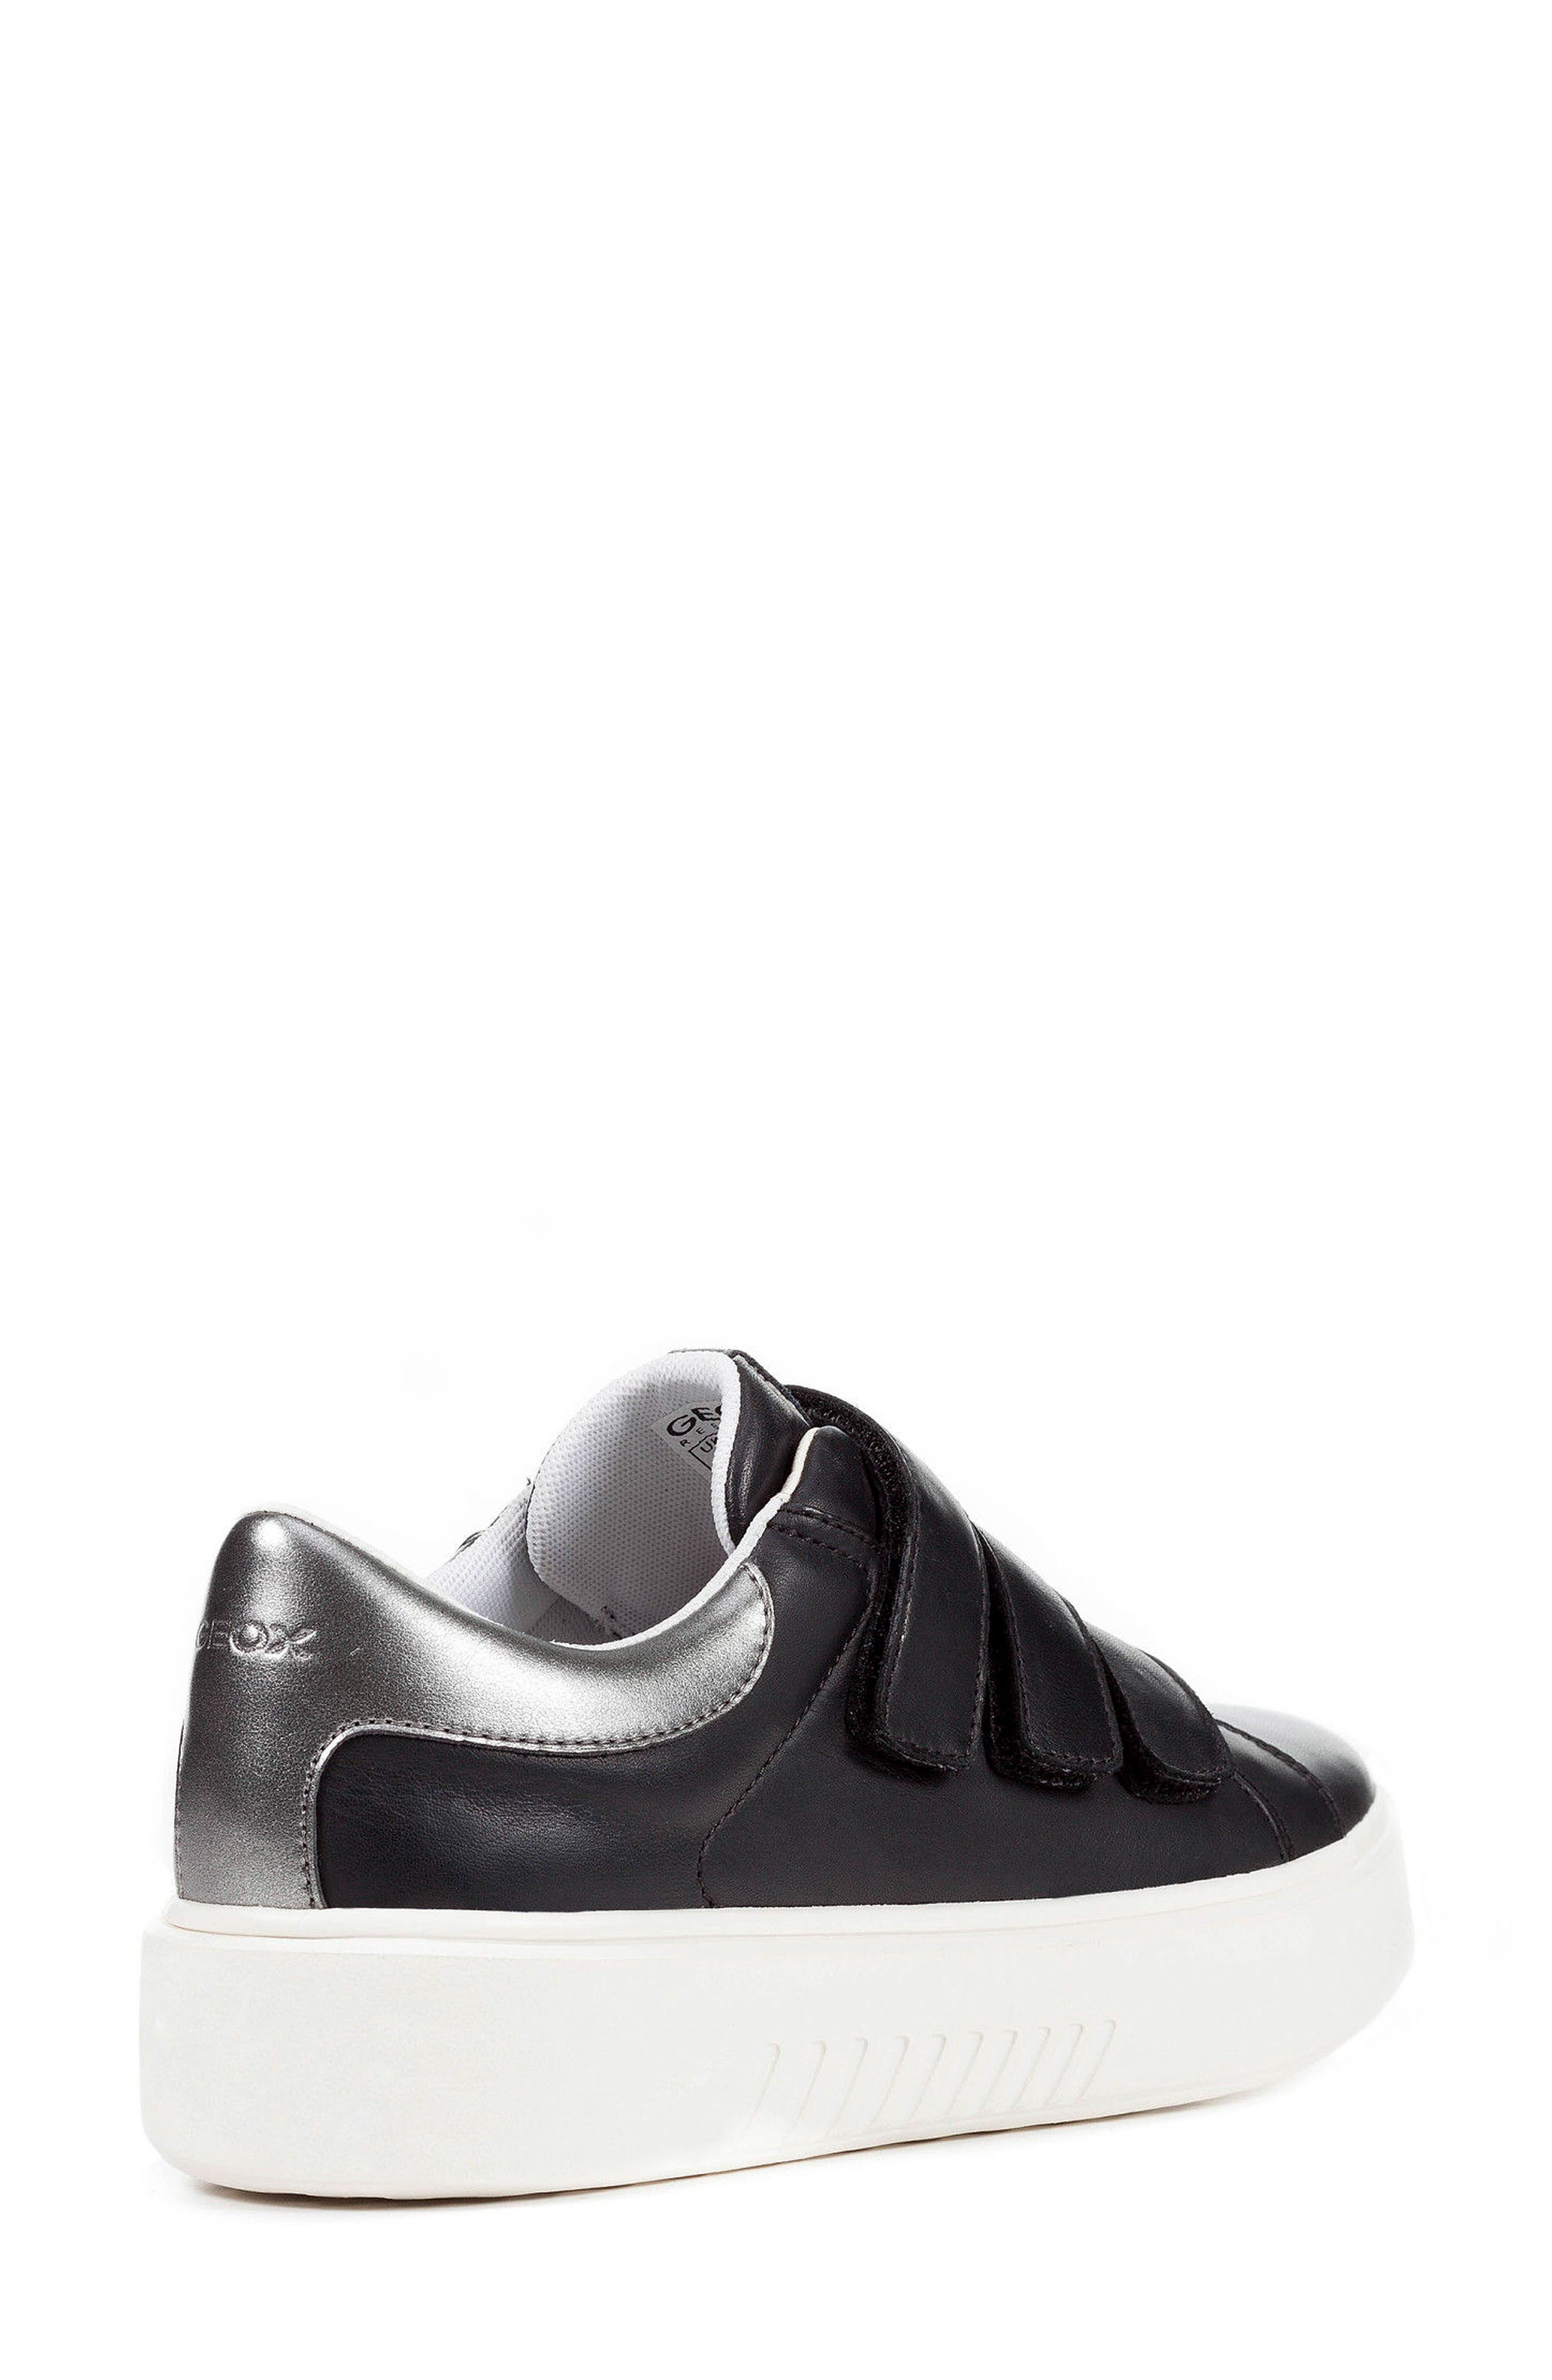 Nhenbus 3 Sneaker,                             Alternate thumbnail 2, color,                             BLACK LEATHER